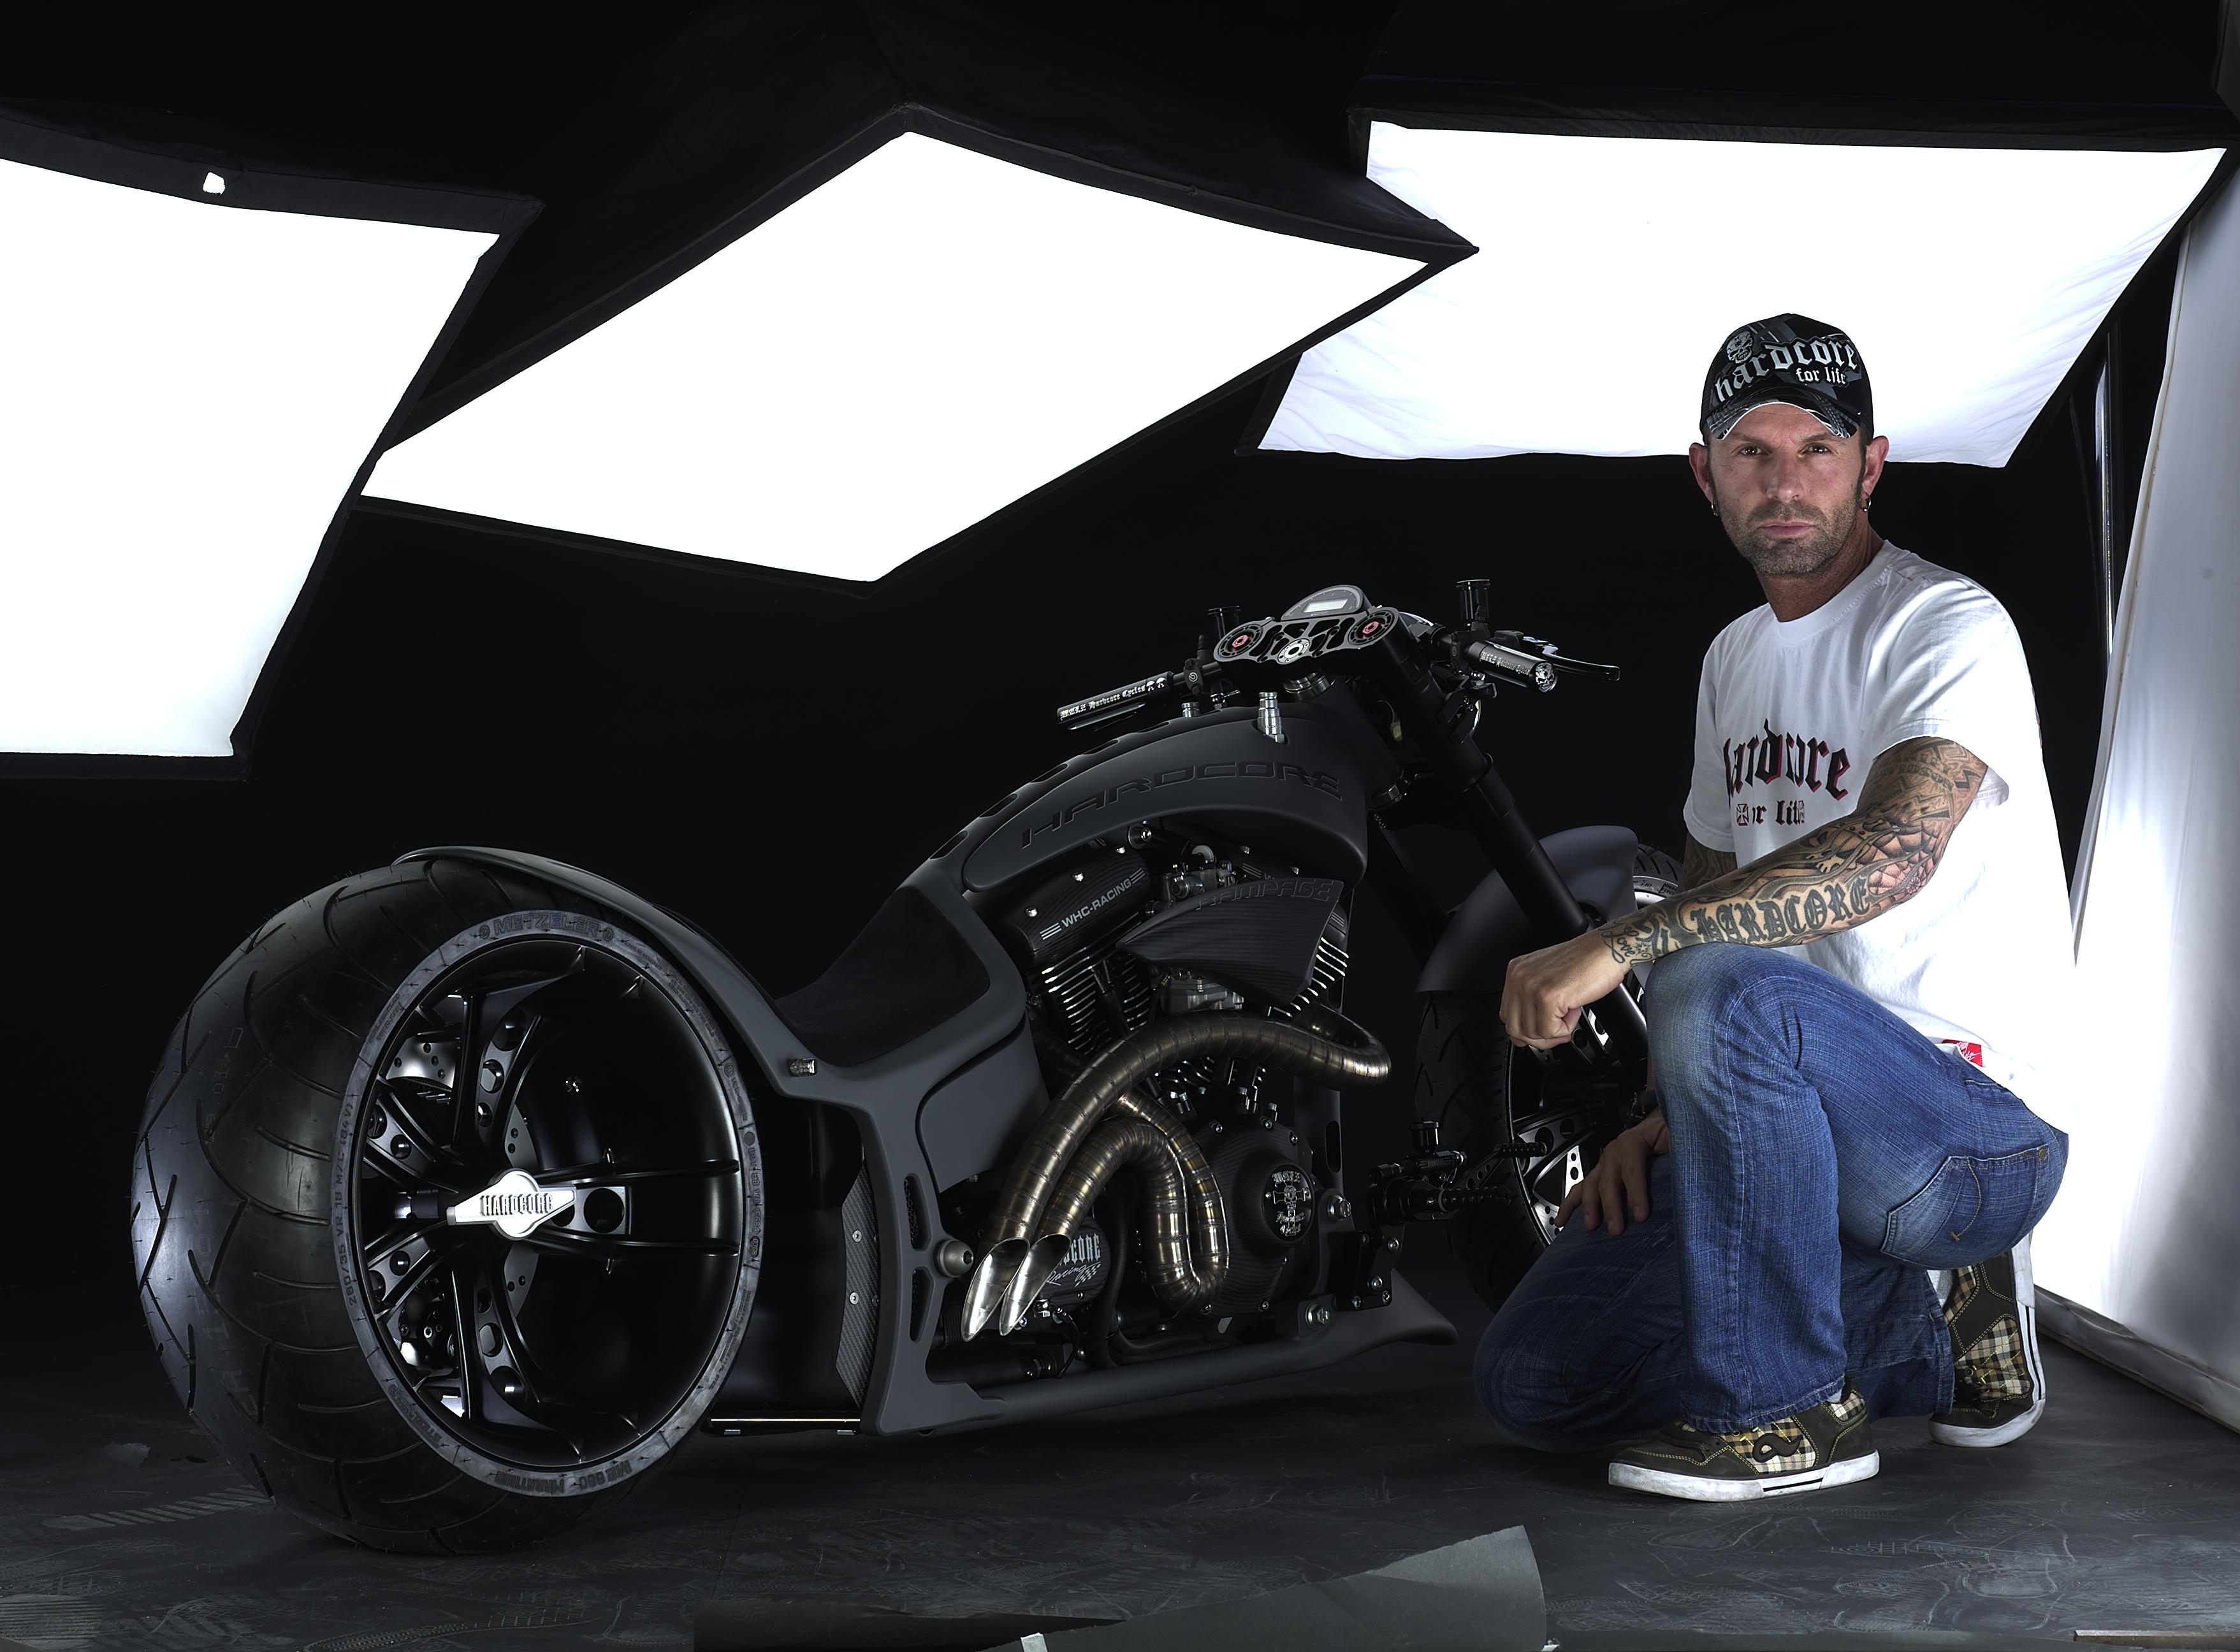 James dean tribute bike by walz hardcore cycles